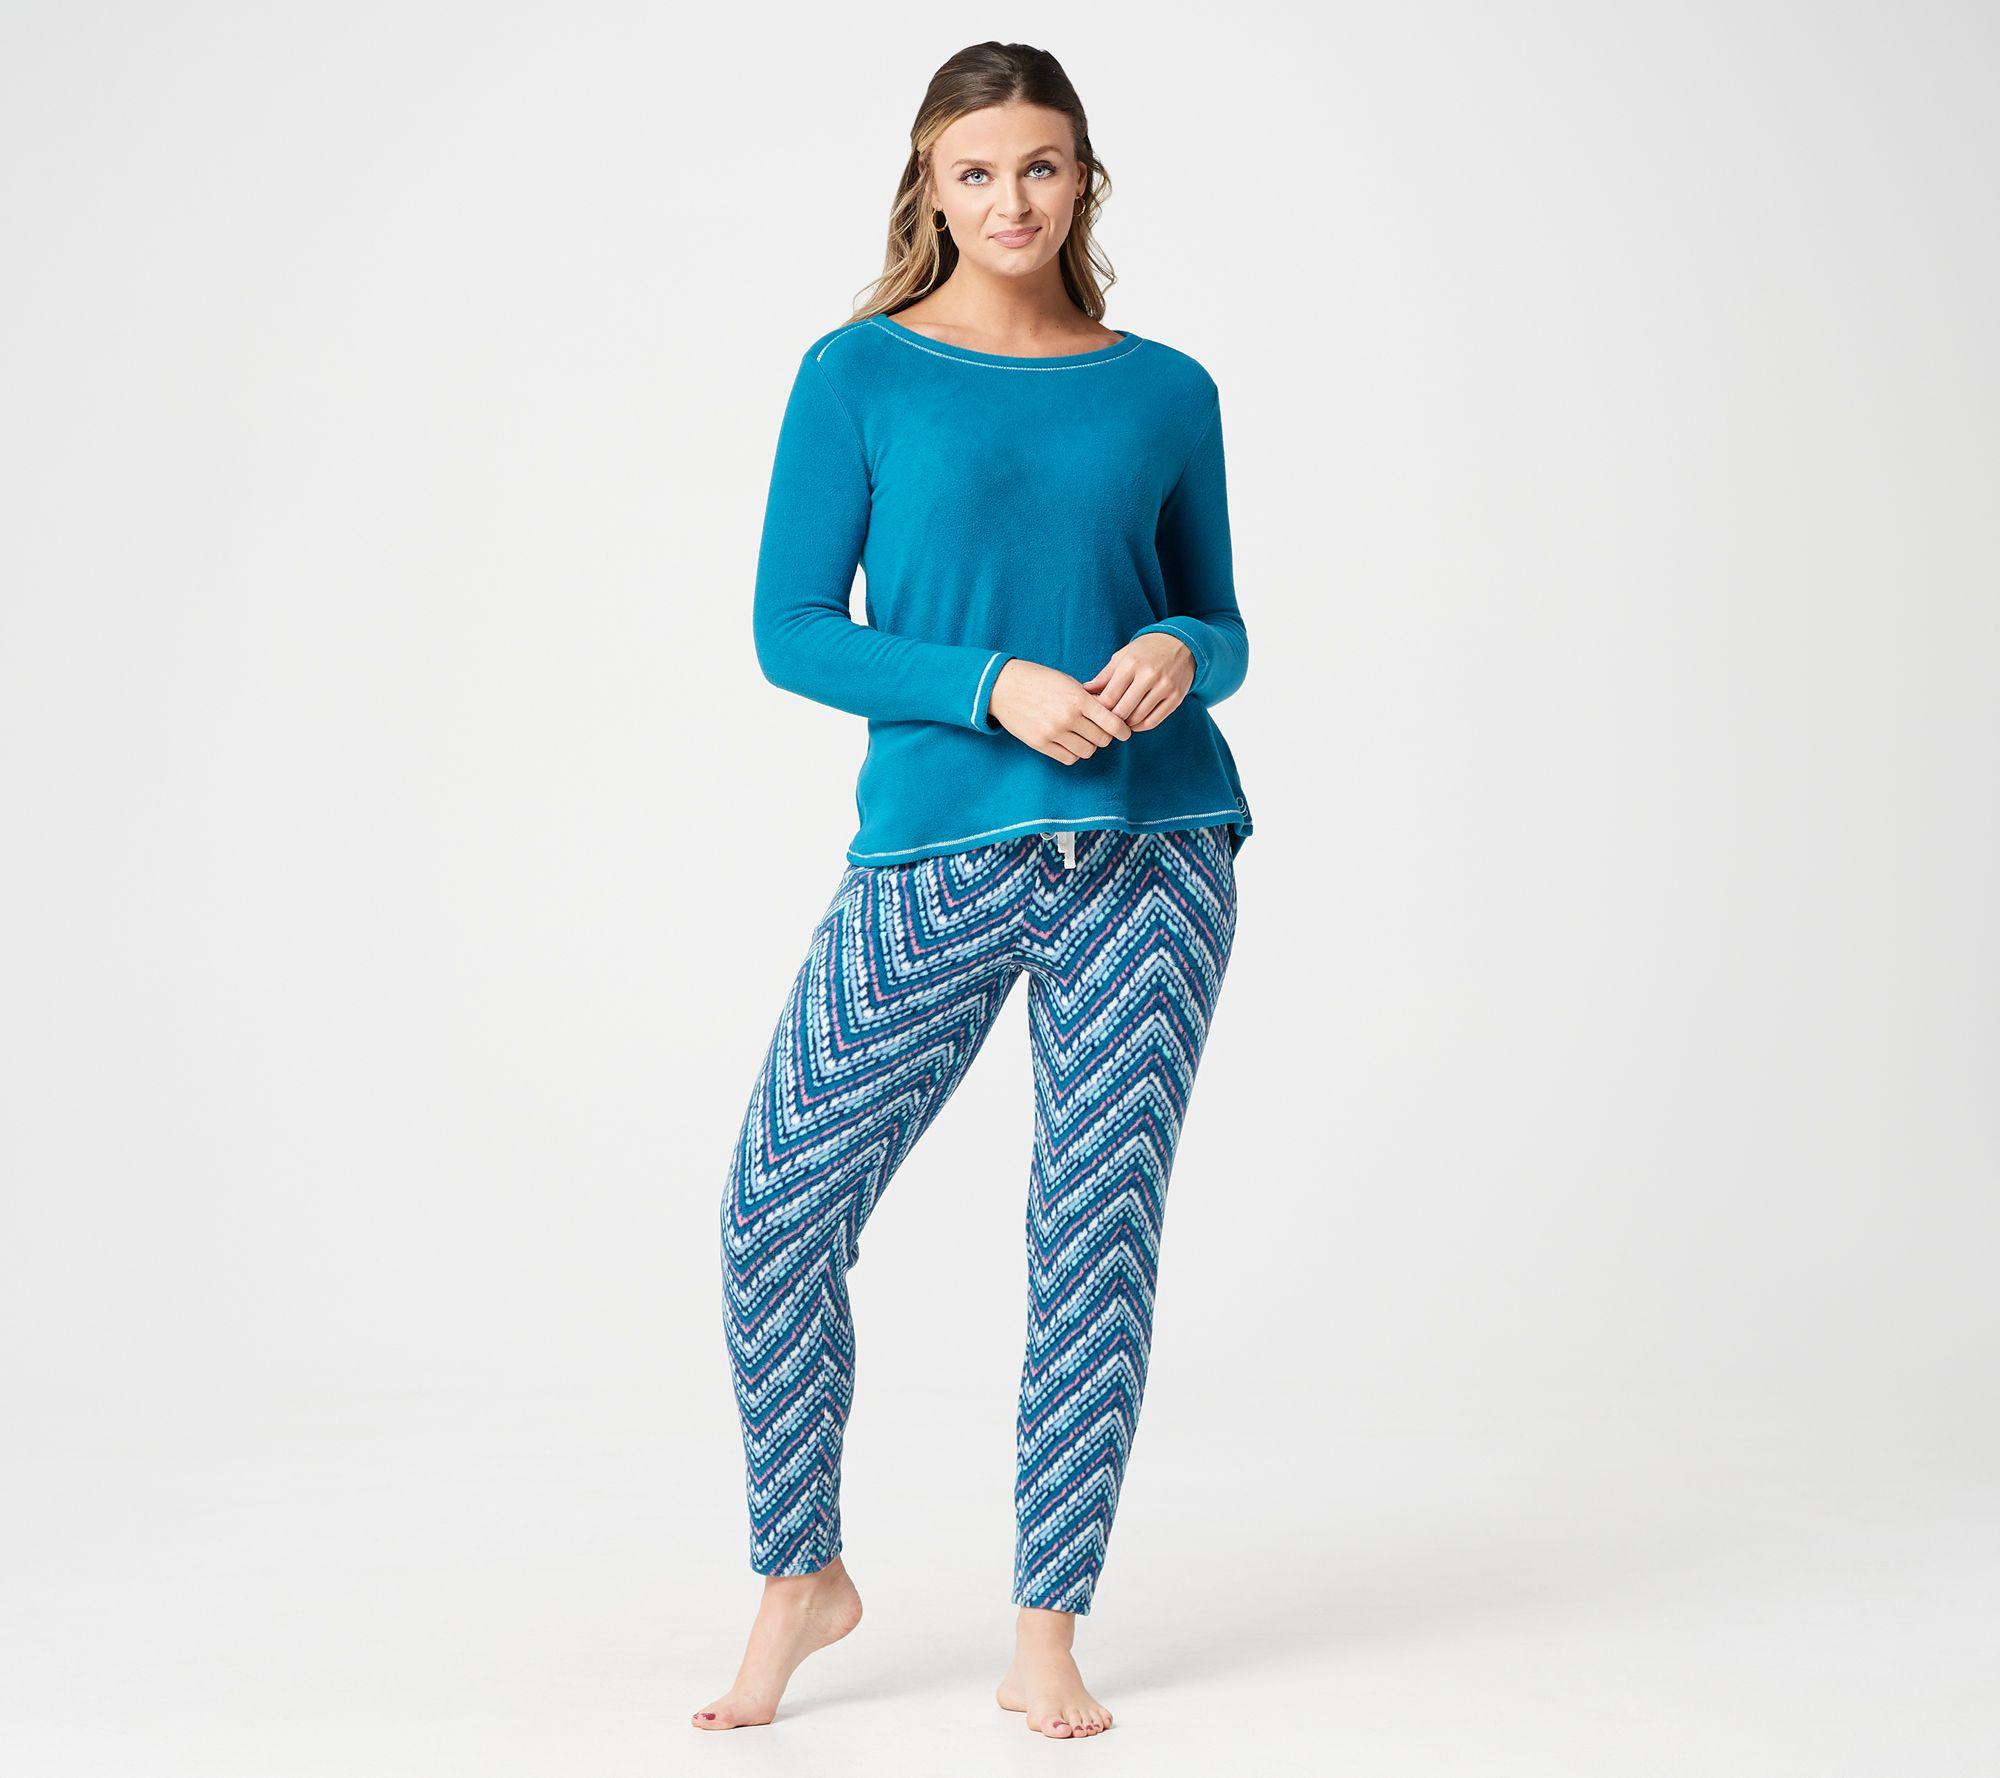 f74c0e24943 Cuddl Duds Regular Fleecewear Stretch Novelty Pajama Set - Page 1 — QVC.com